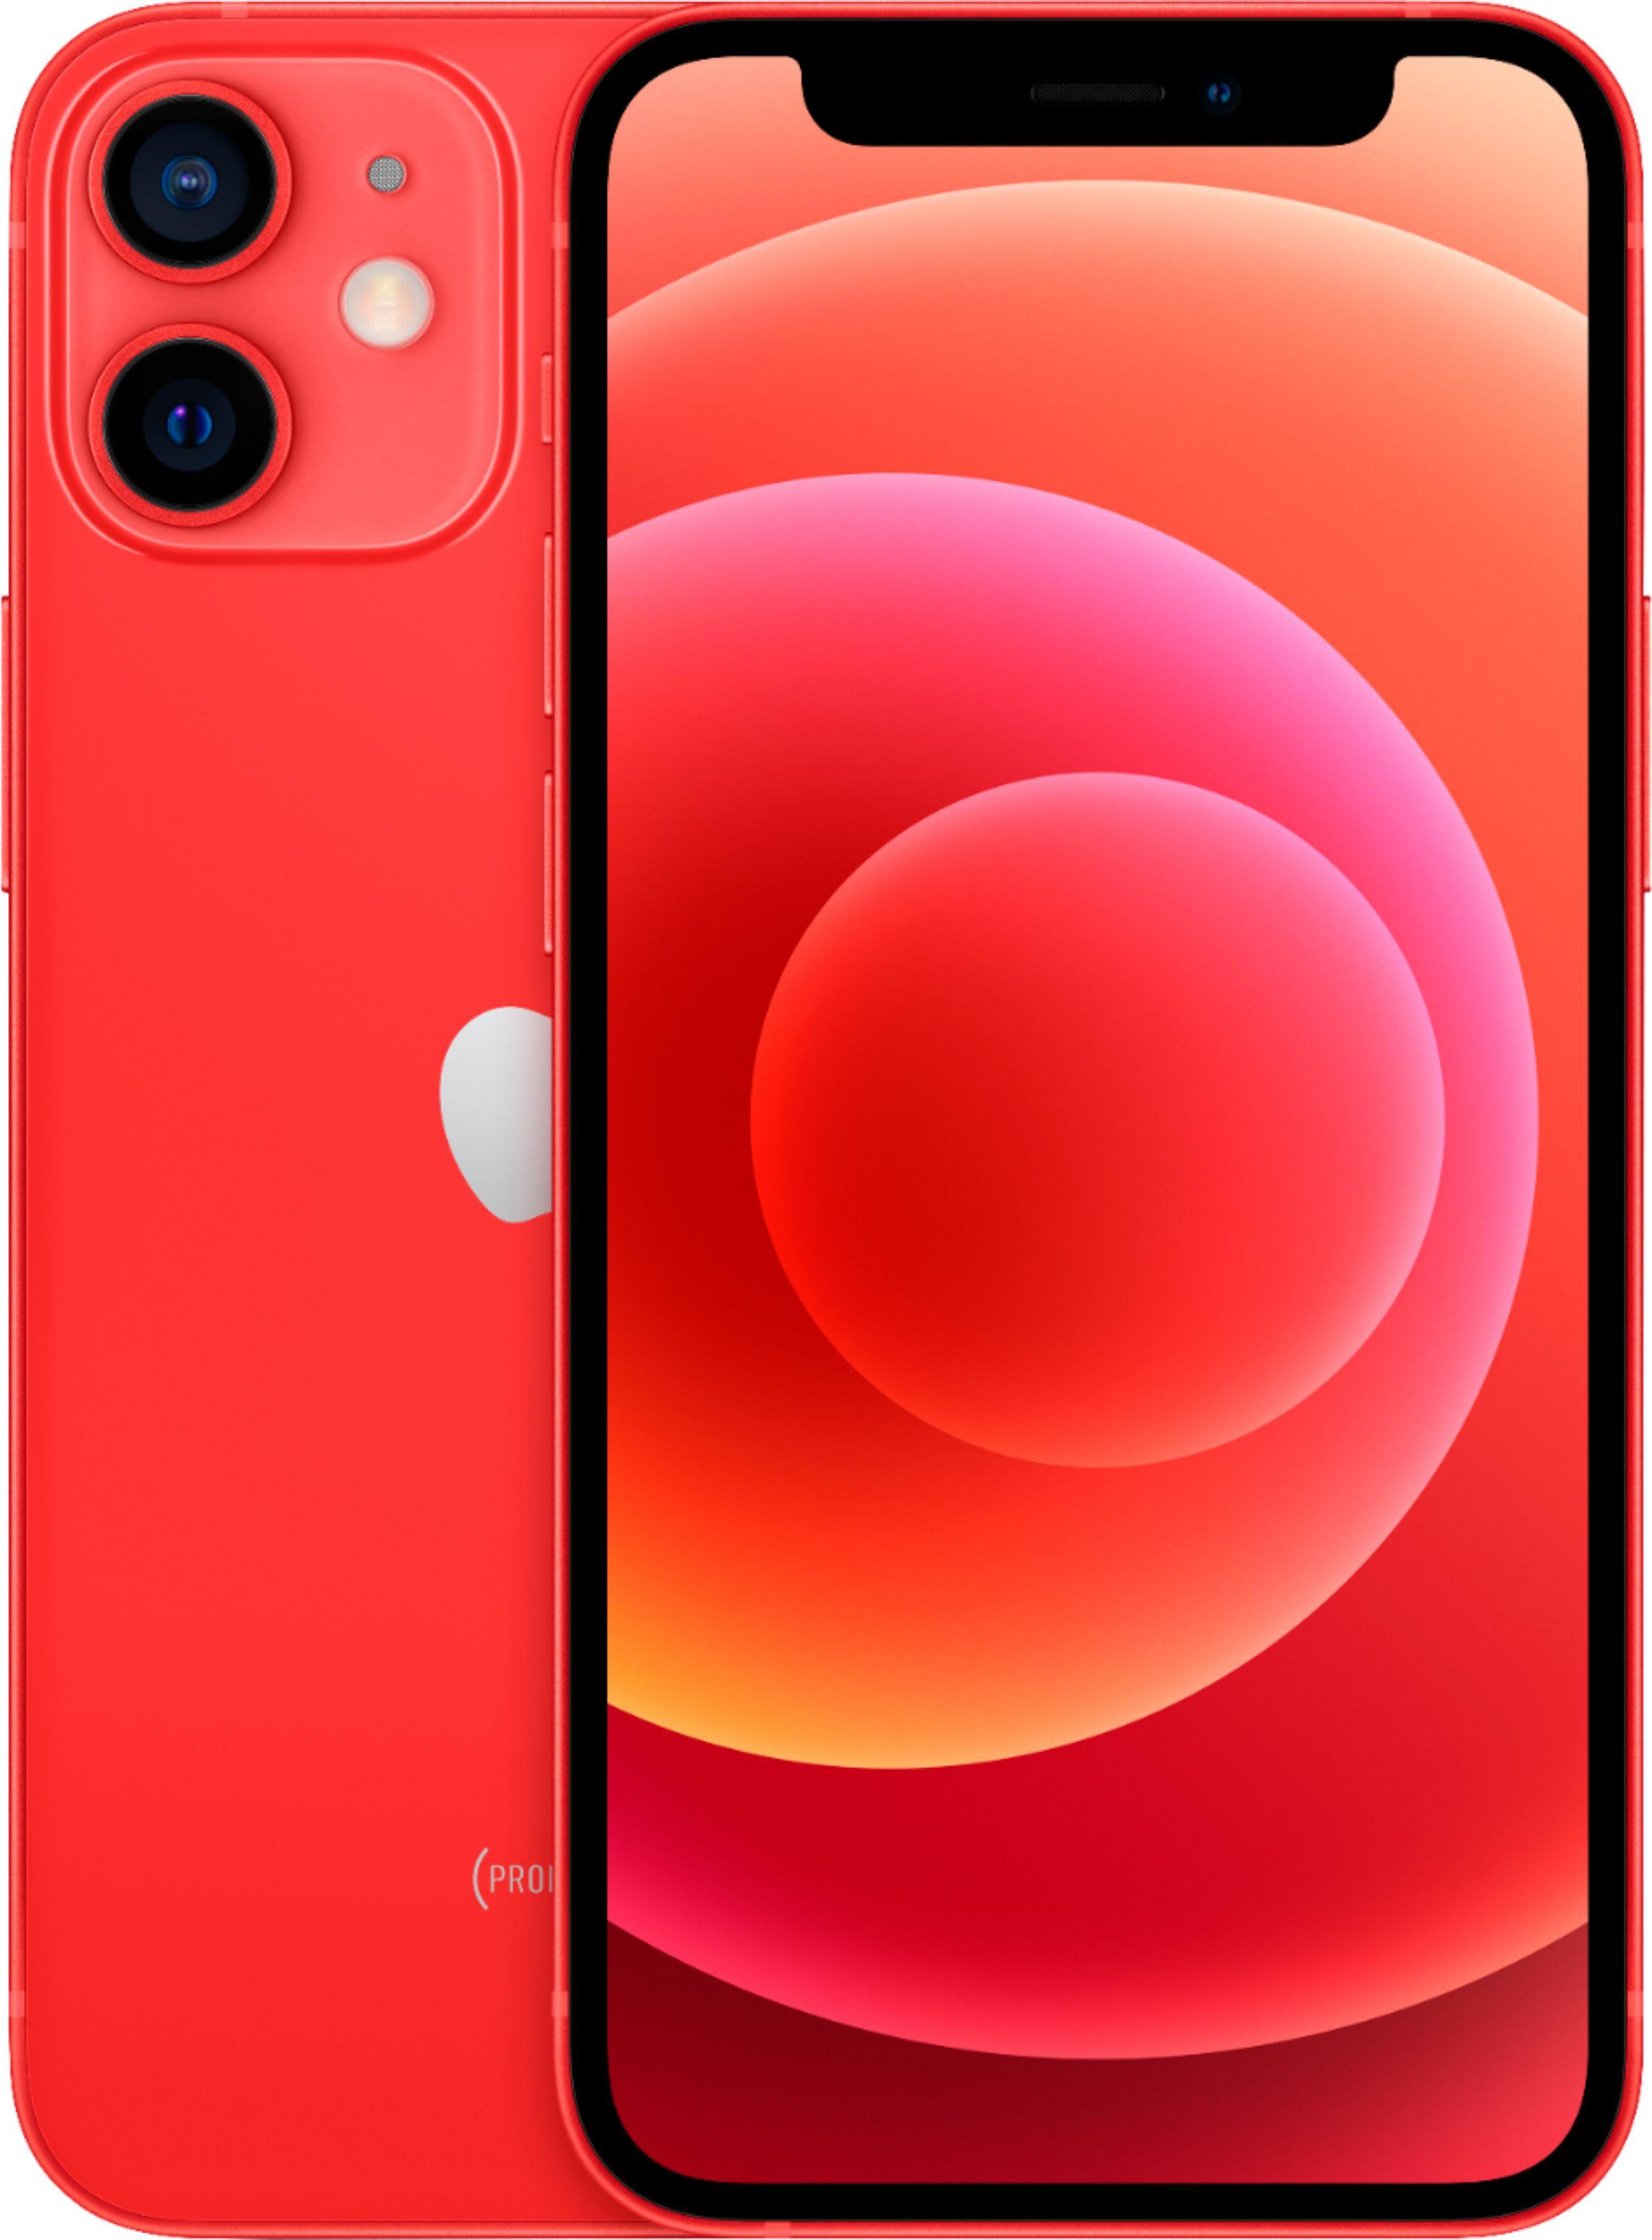 iphone 11 se or iphone 12 mini